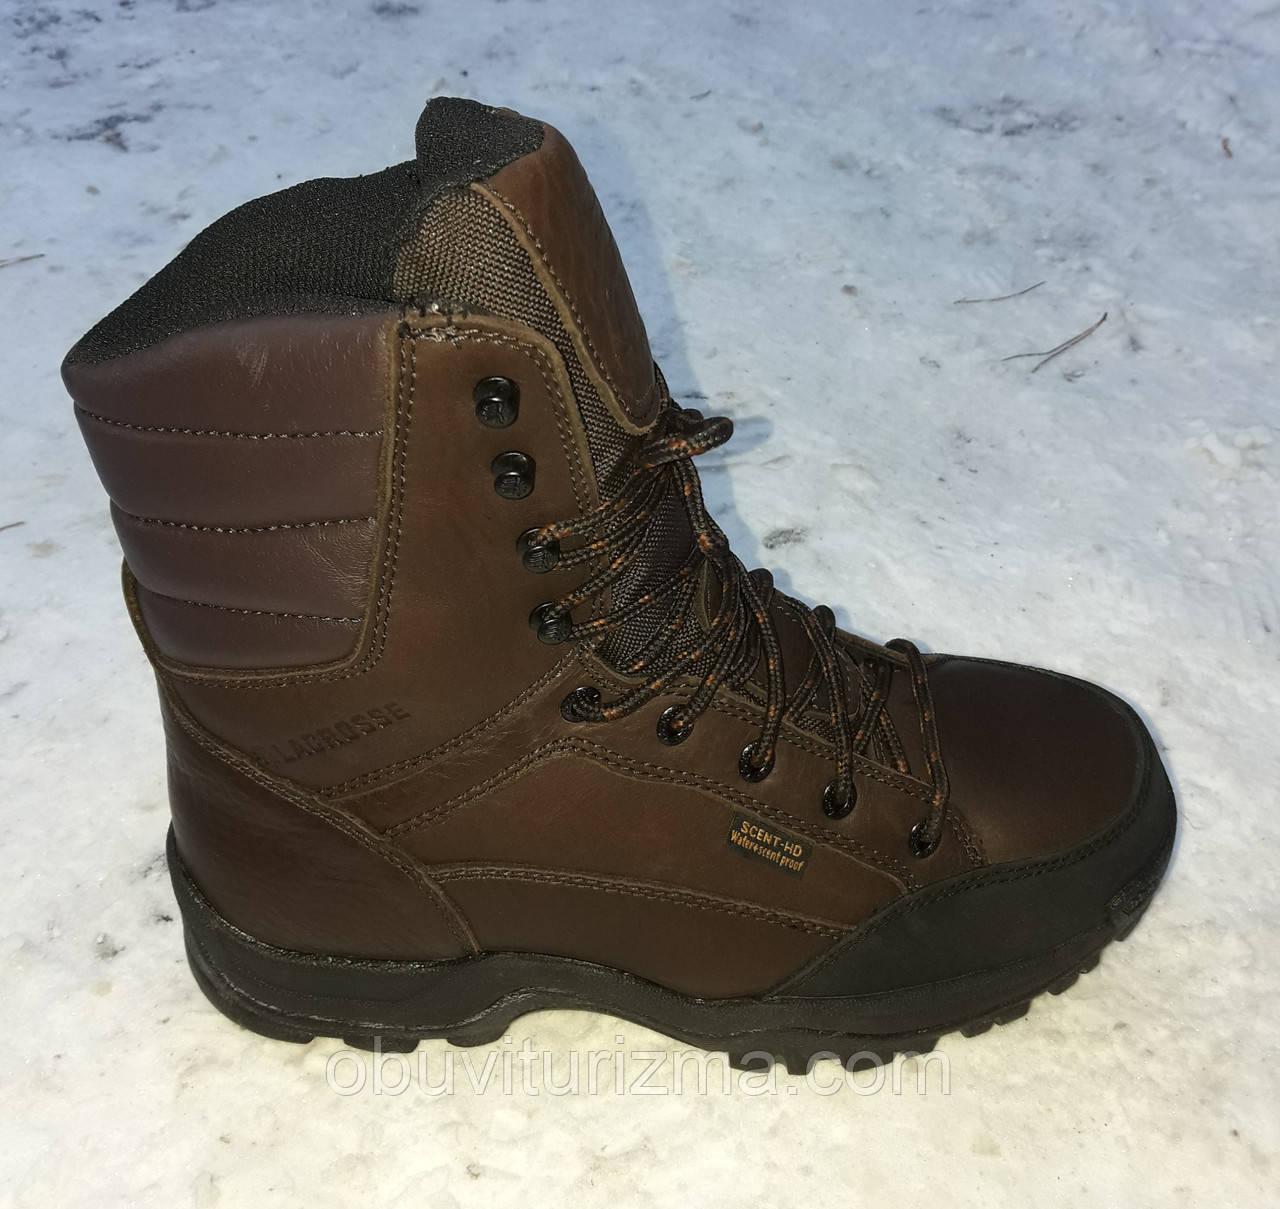 Ботинки для Охотника LaCrosse 400gr Thinsulate -40С (USA-10-28см) — в  Категории